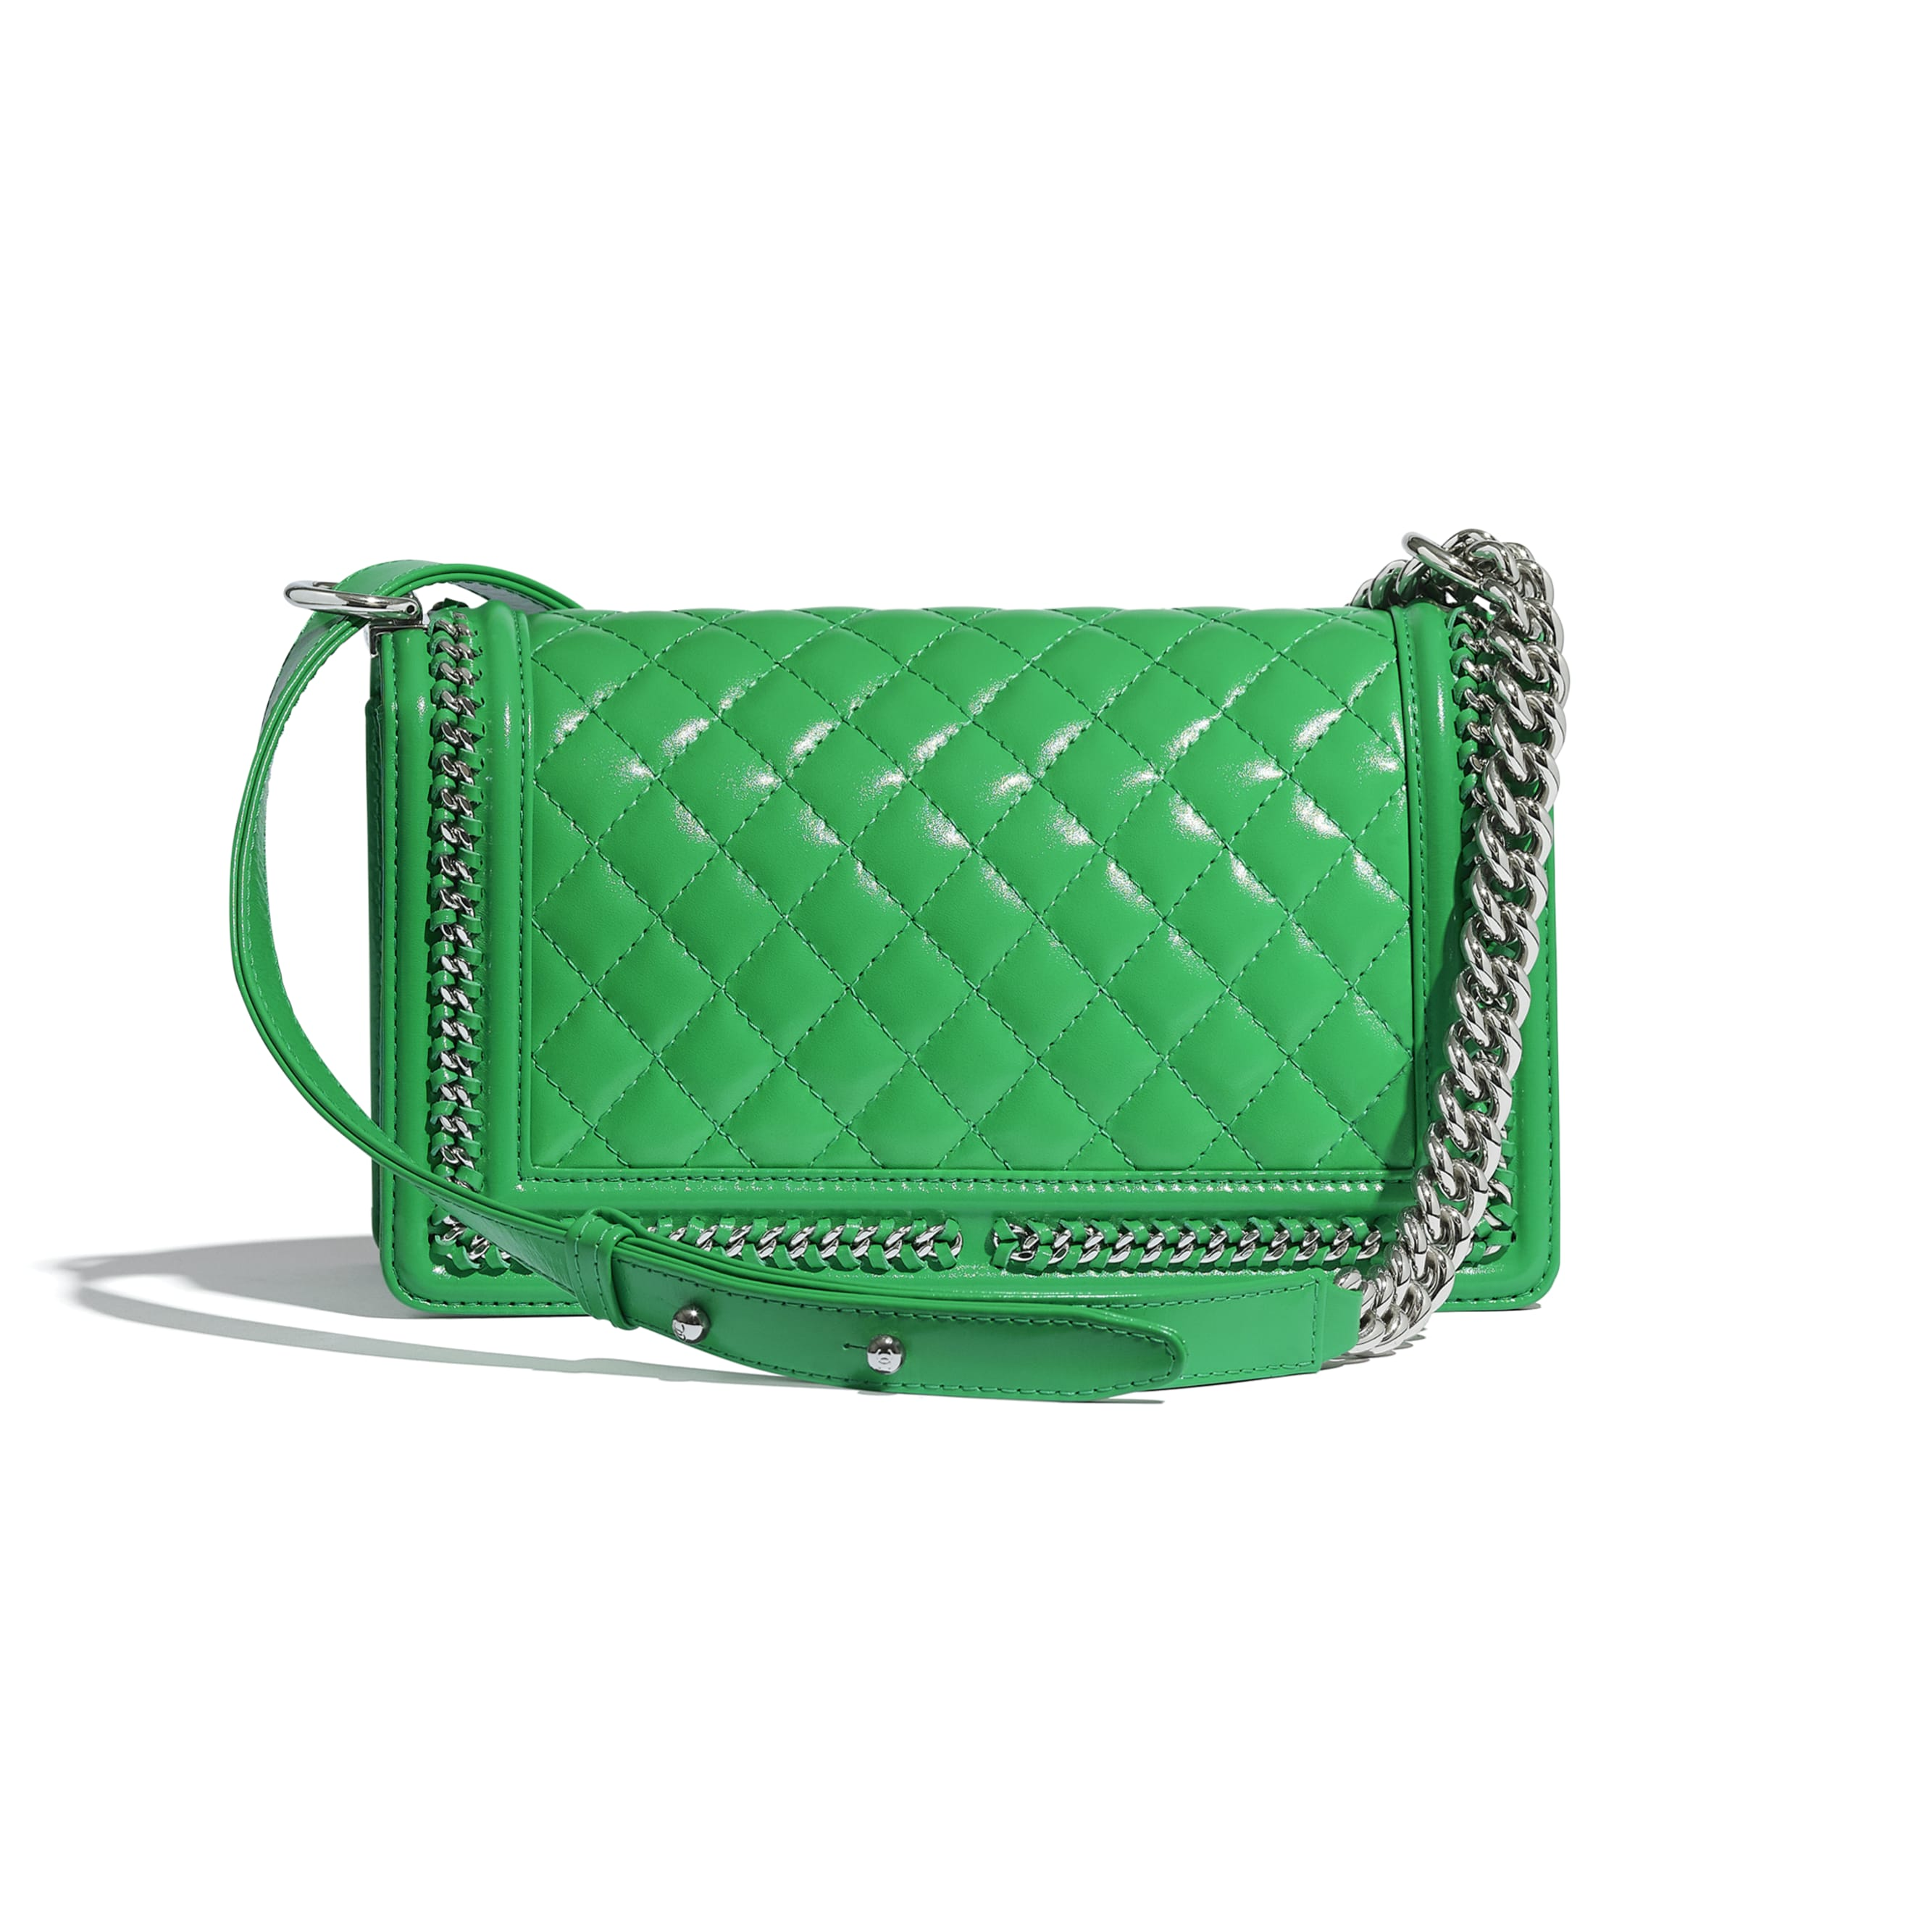 BOY CHANEL Handbag - Green - Calfskin & Silver Metal - CHANEL - Alternative view - see standard sized version